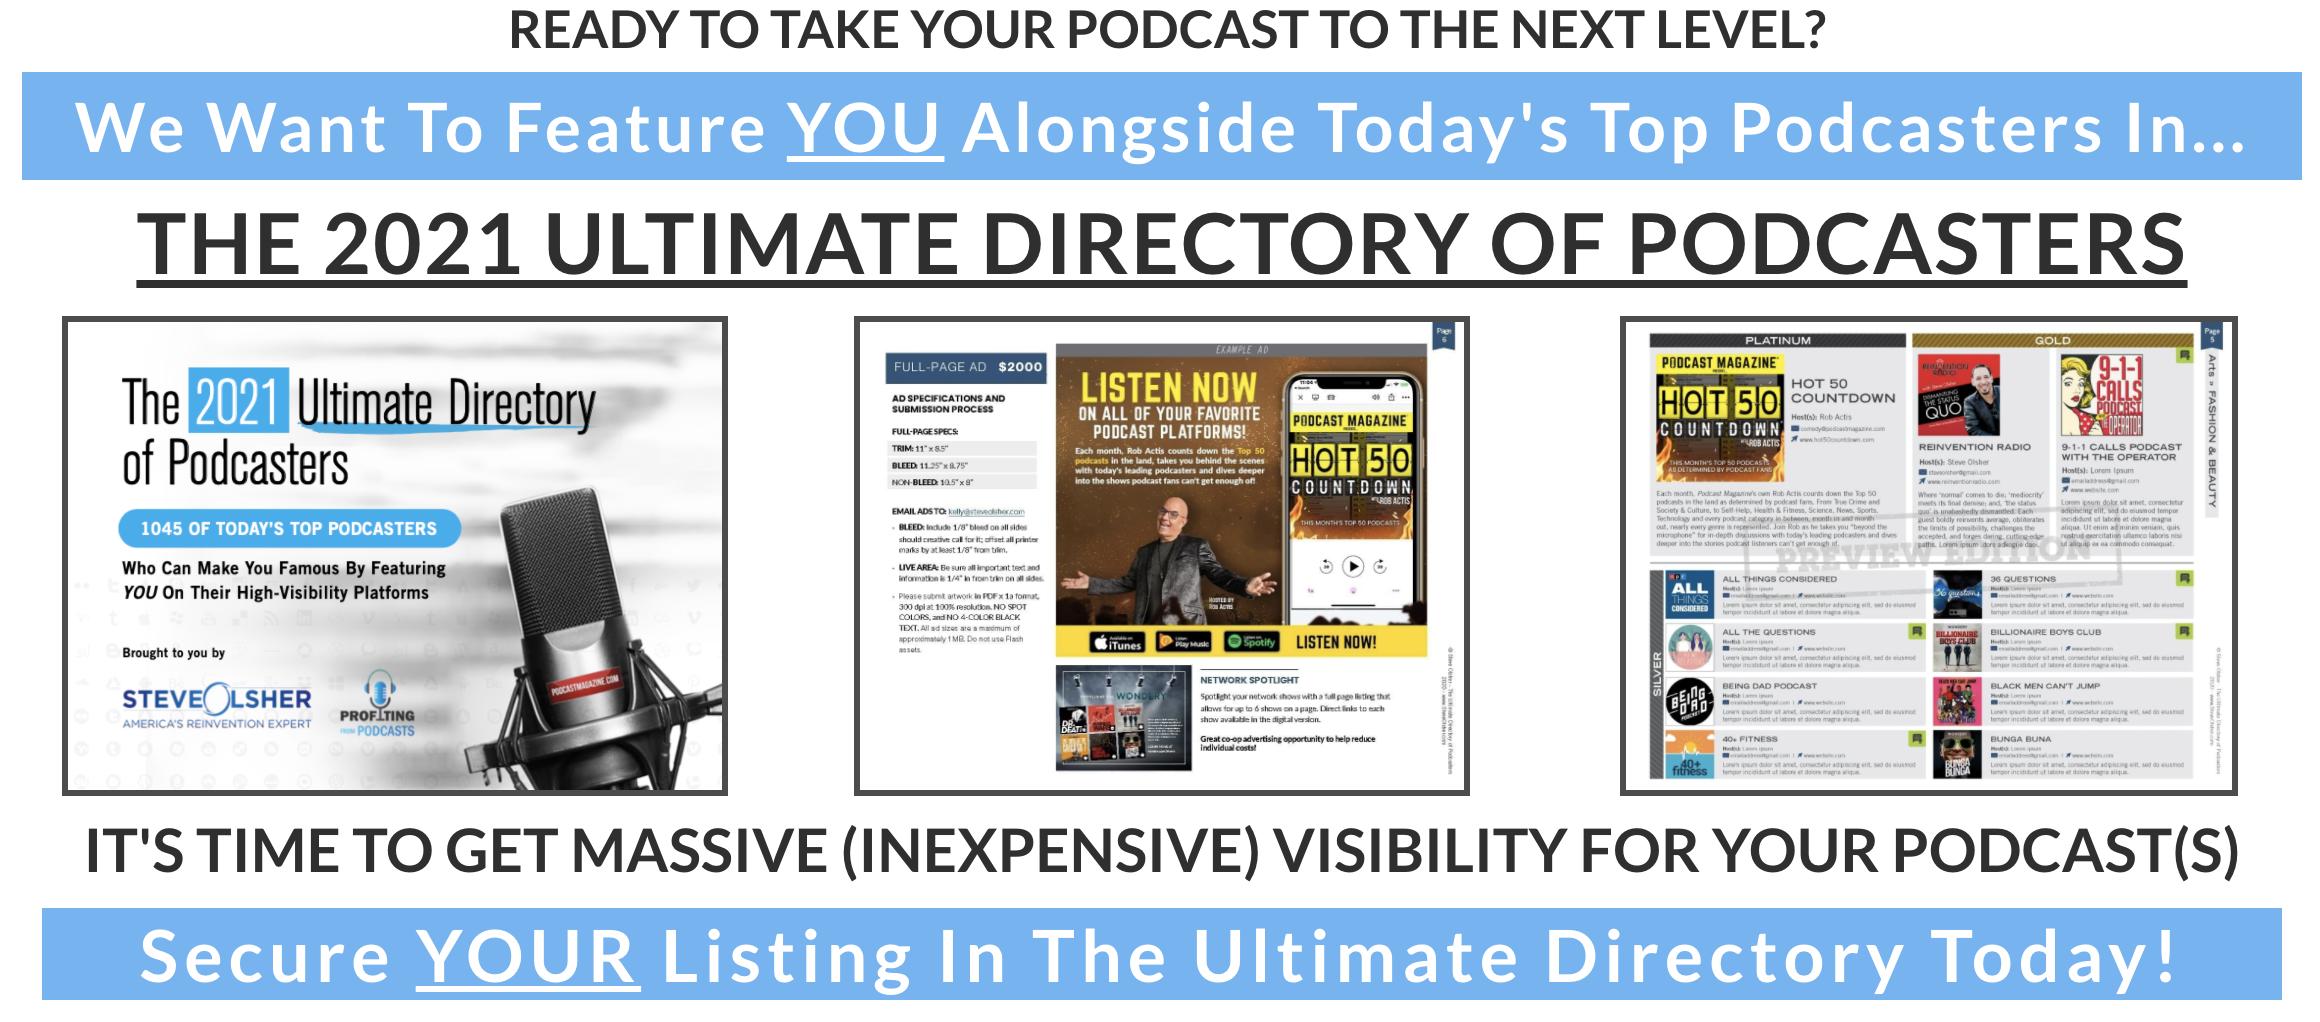 Steve Olshers podcast directory